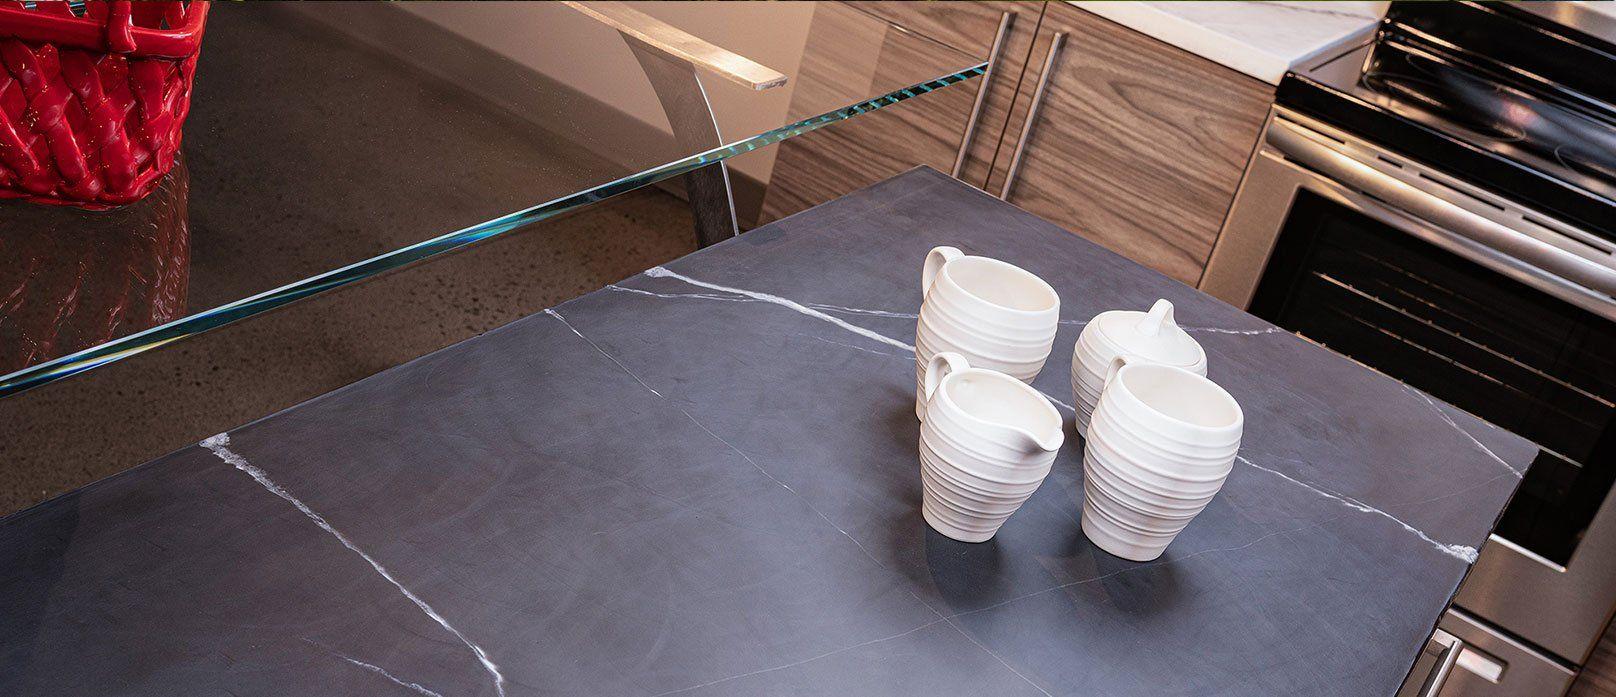 Faqs In 2020 Concrete Countertop Forms Concrete Countertops